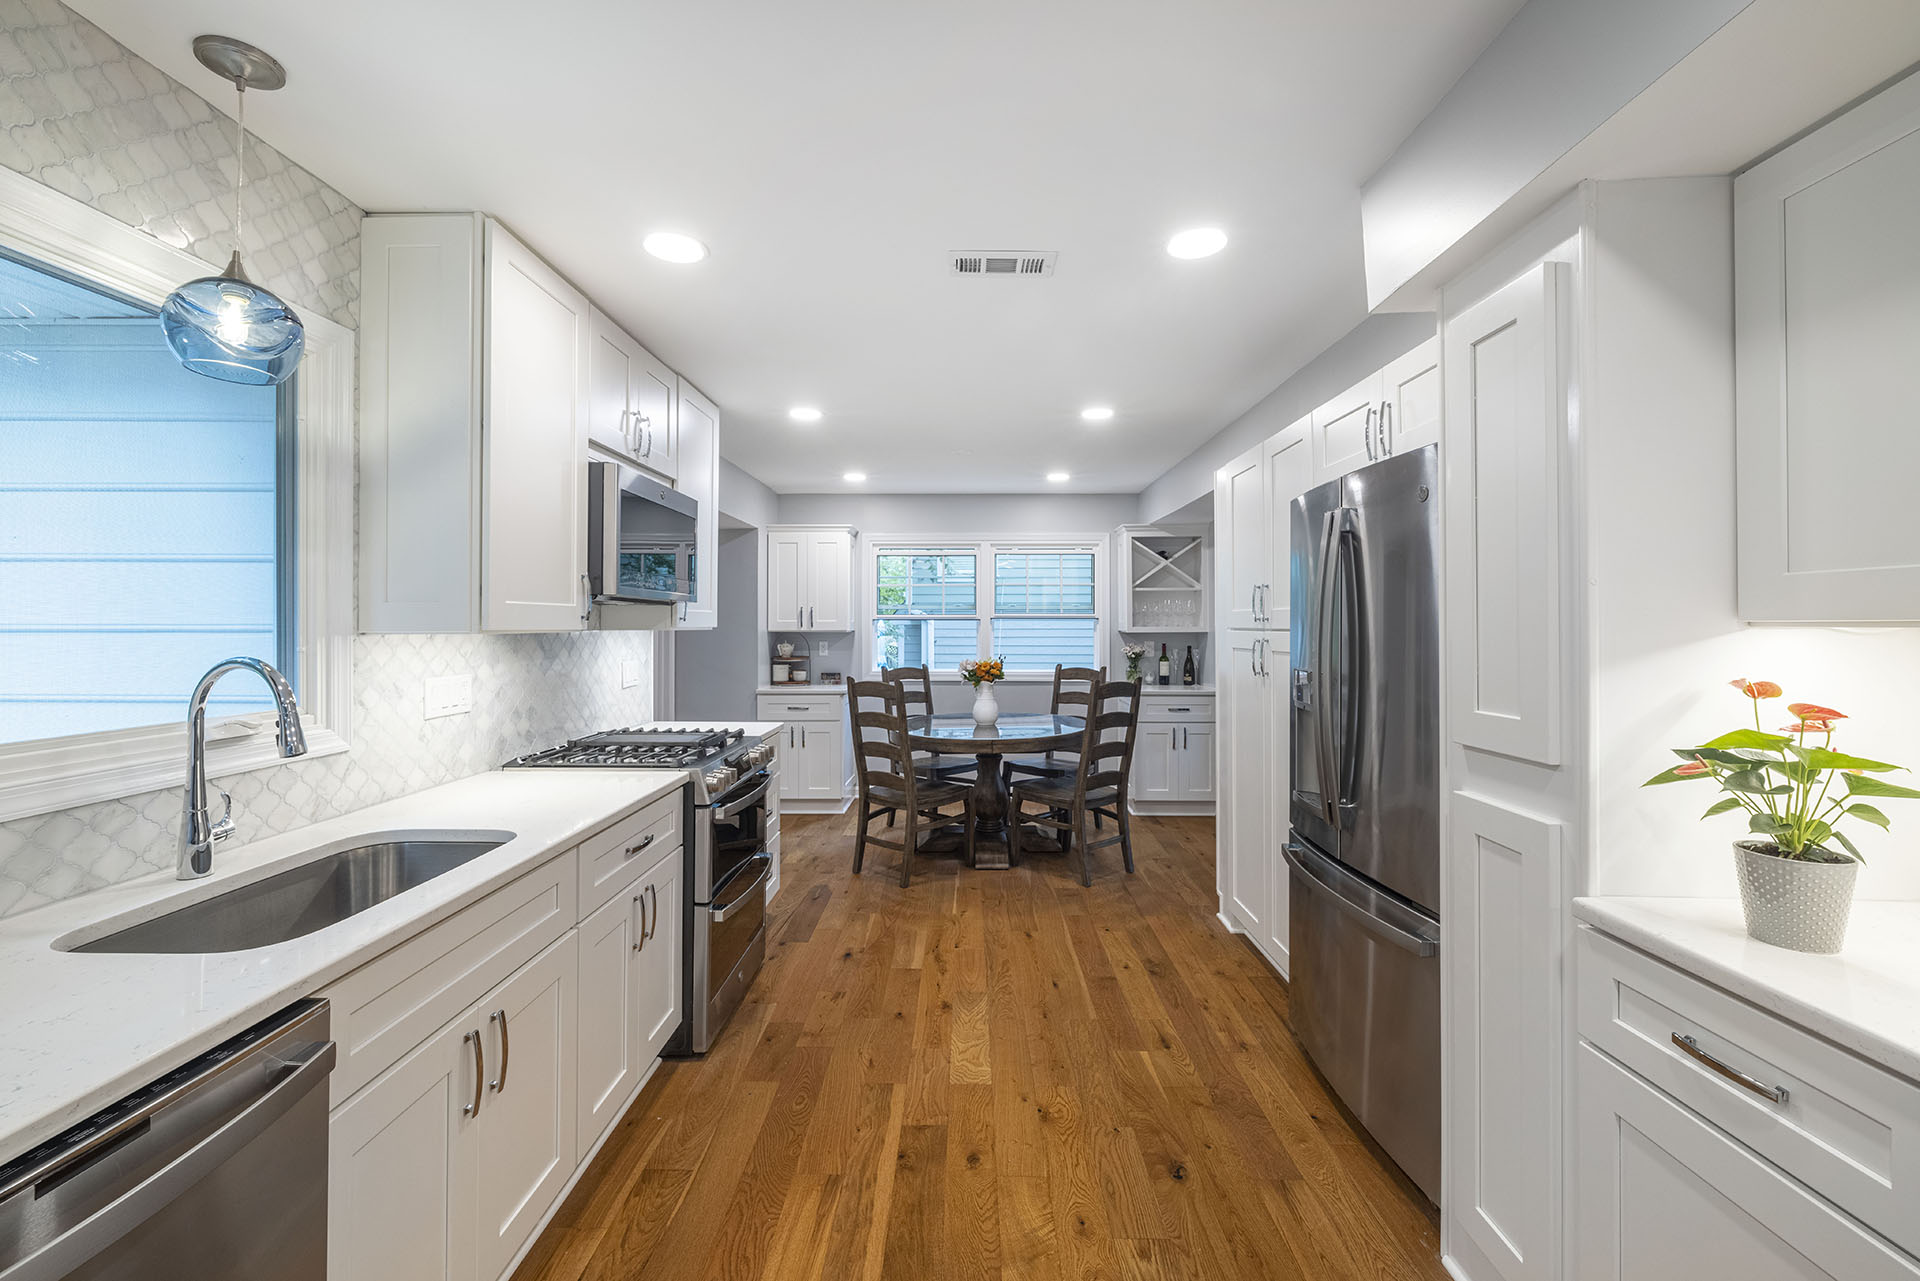 Kitchen Remodeling in Alexandria, VA - Solid Kitchen ...